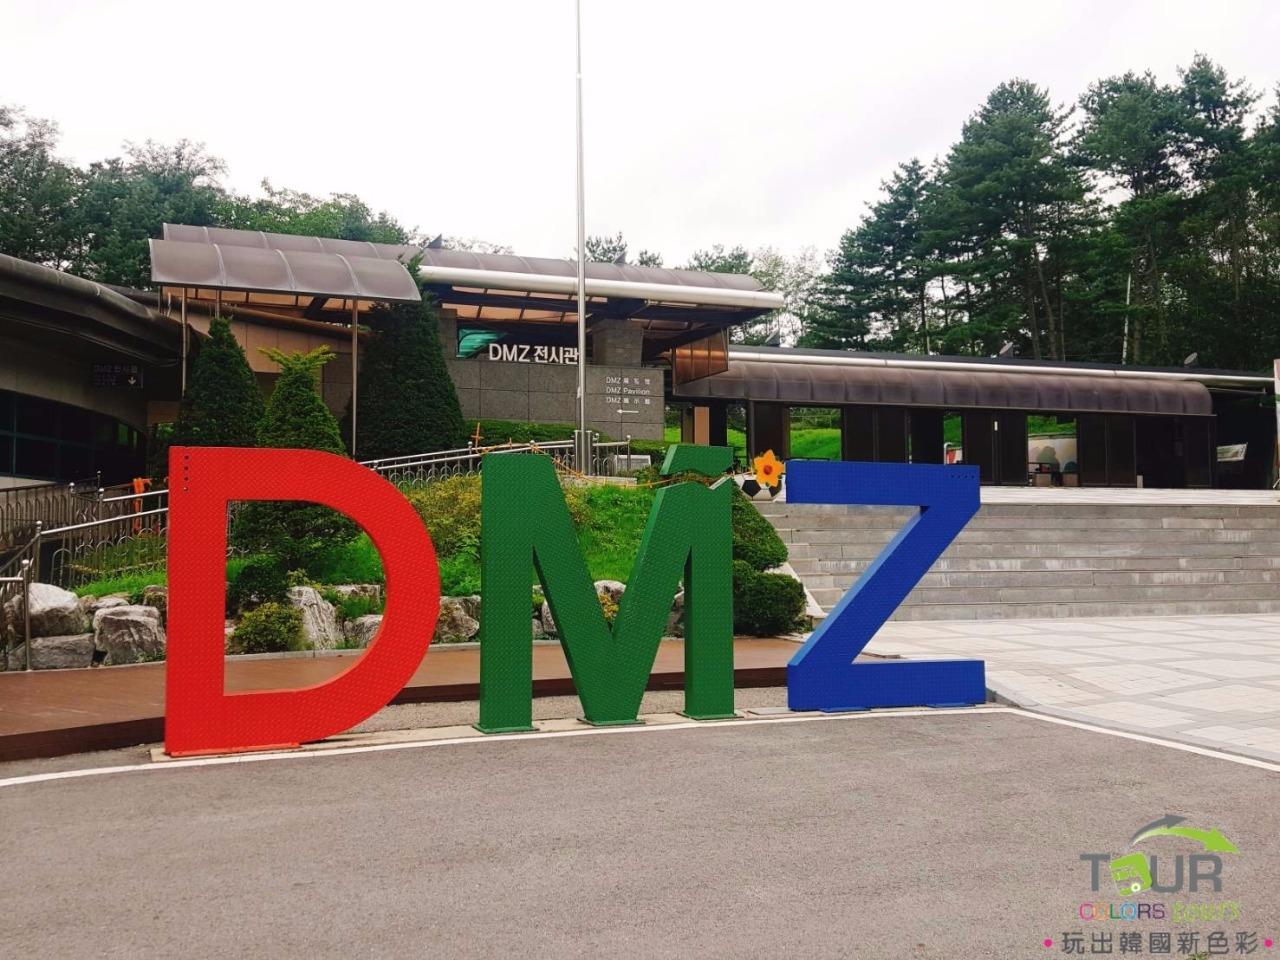 COLORS TOURS 哈韓YO — 【韓國 DMZ】前進神秘38度停戰線 一窺神秘南北韓邊境 </p>           </div><!-- .entry-content -->           </article><!-- #post-## -->  <nav class=